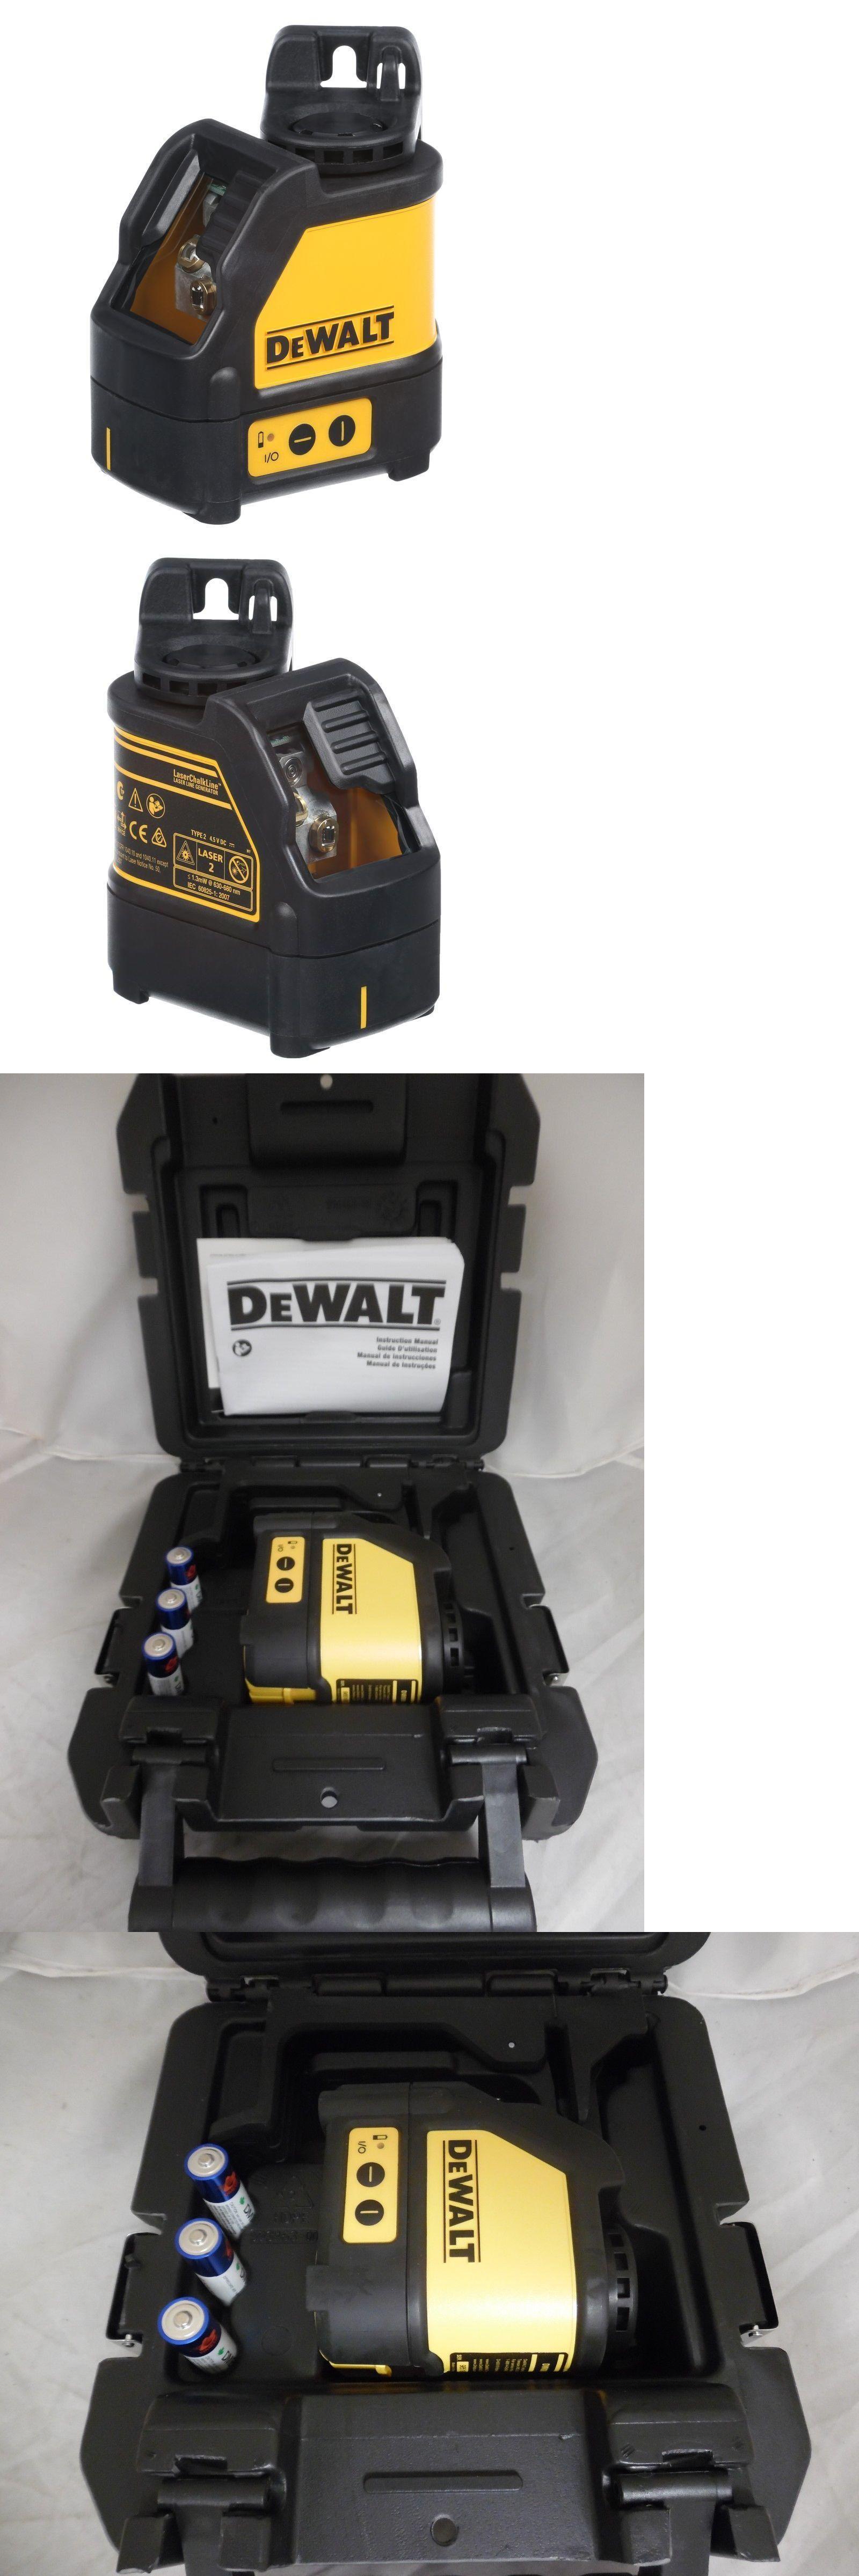 Laser Measuring Tools 126396 Dewalt Dw088k Cross Line Laser Buy It Now Only 99 99 On Ebay Laser Measuring Tools Dewalt Dewalt Measuring Tools Laser